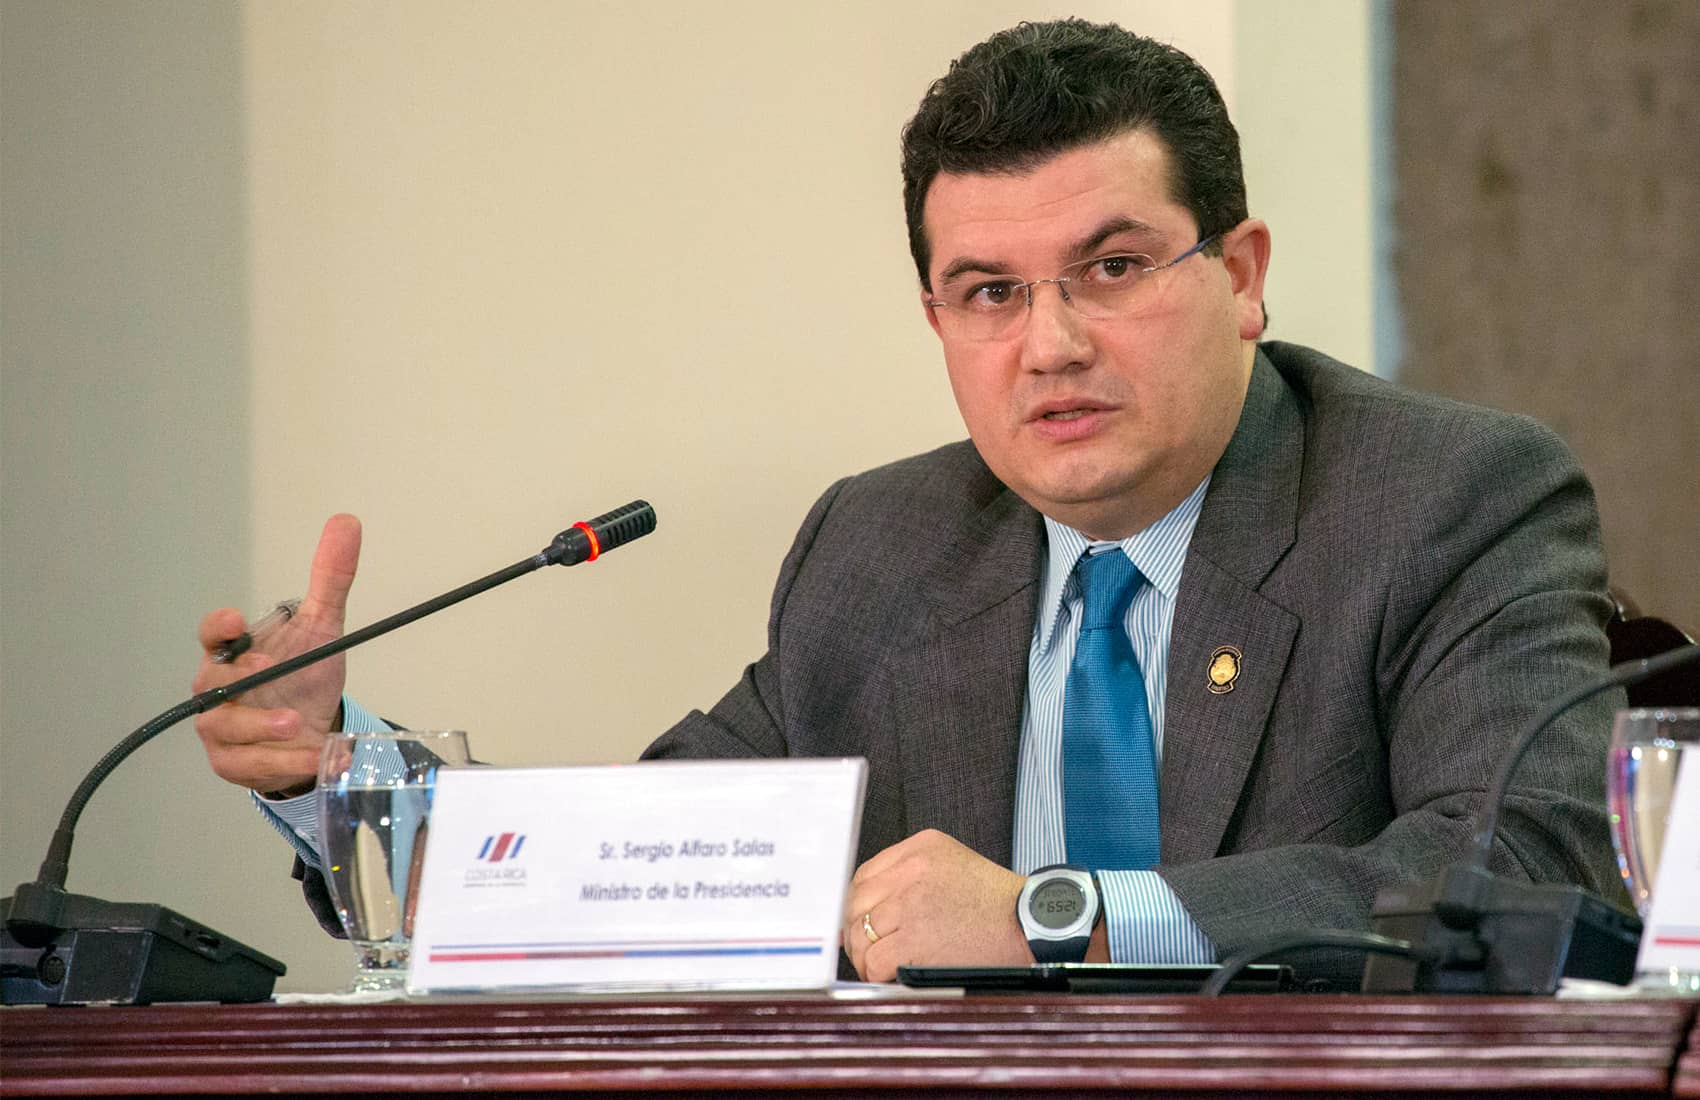 No fiscal reform yet: Presidency Minister Sergio Alfaro